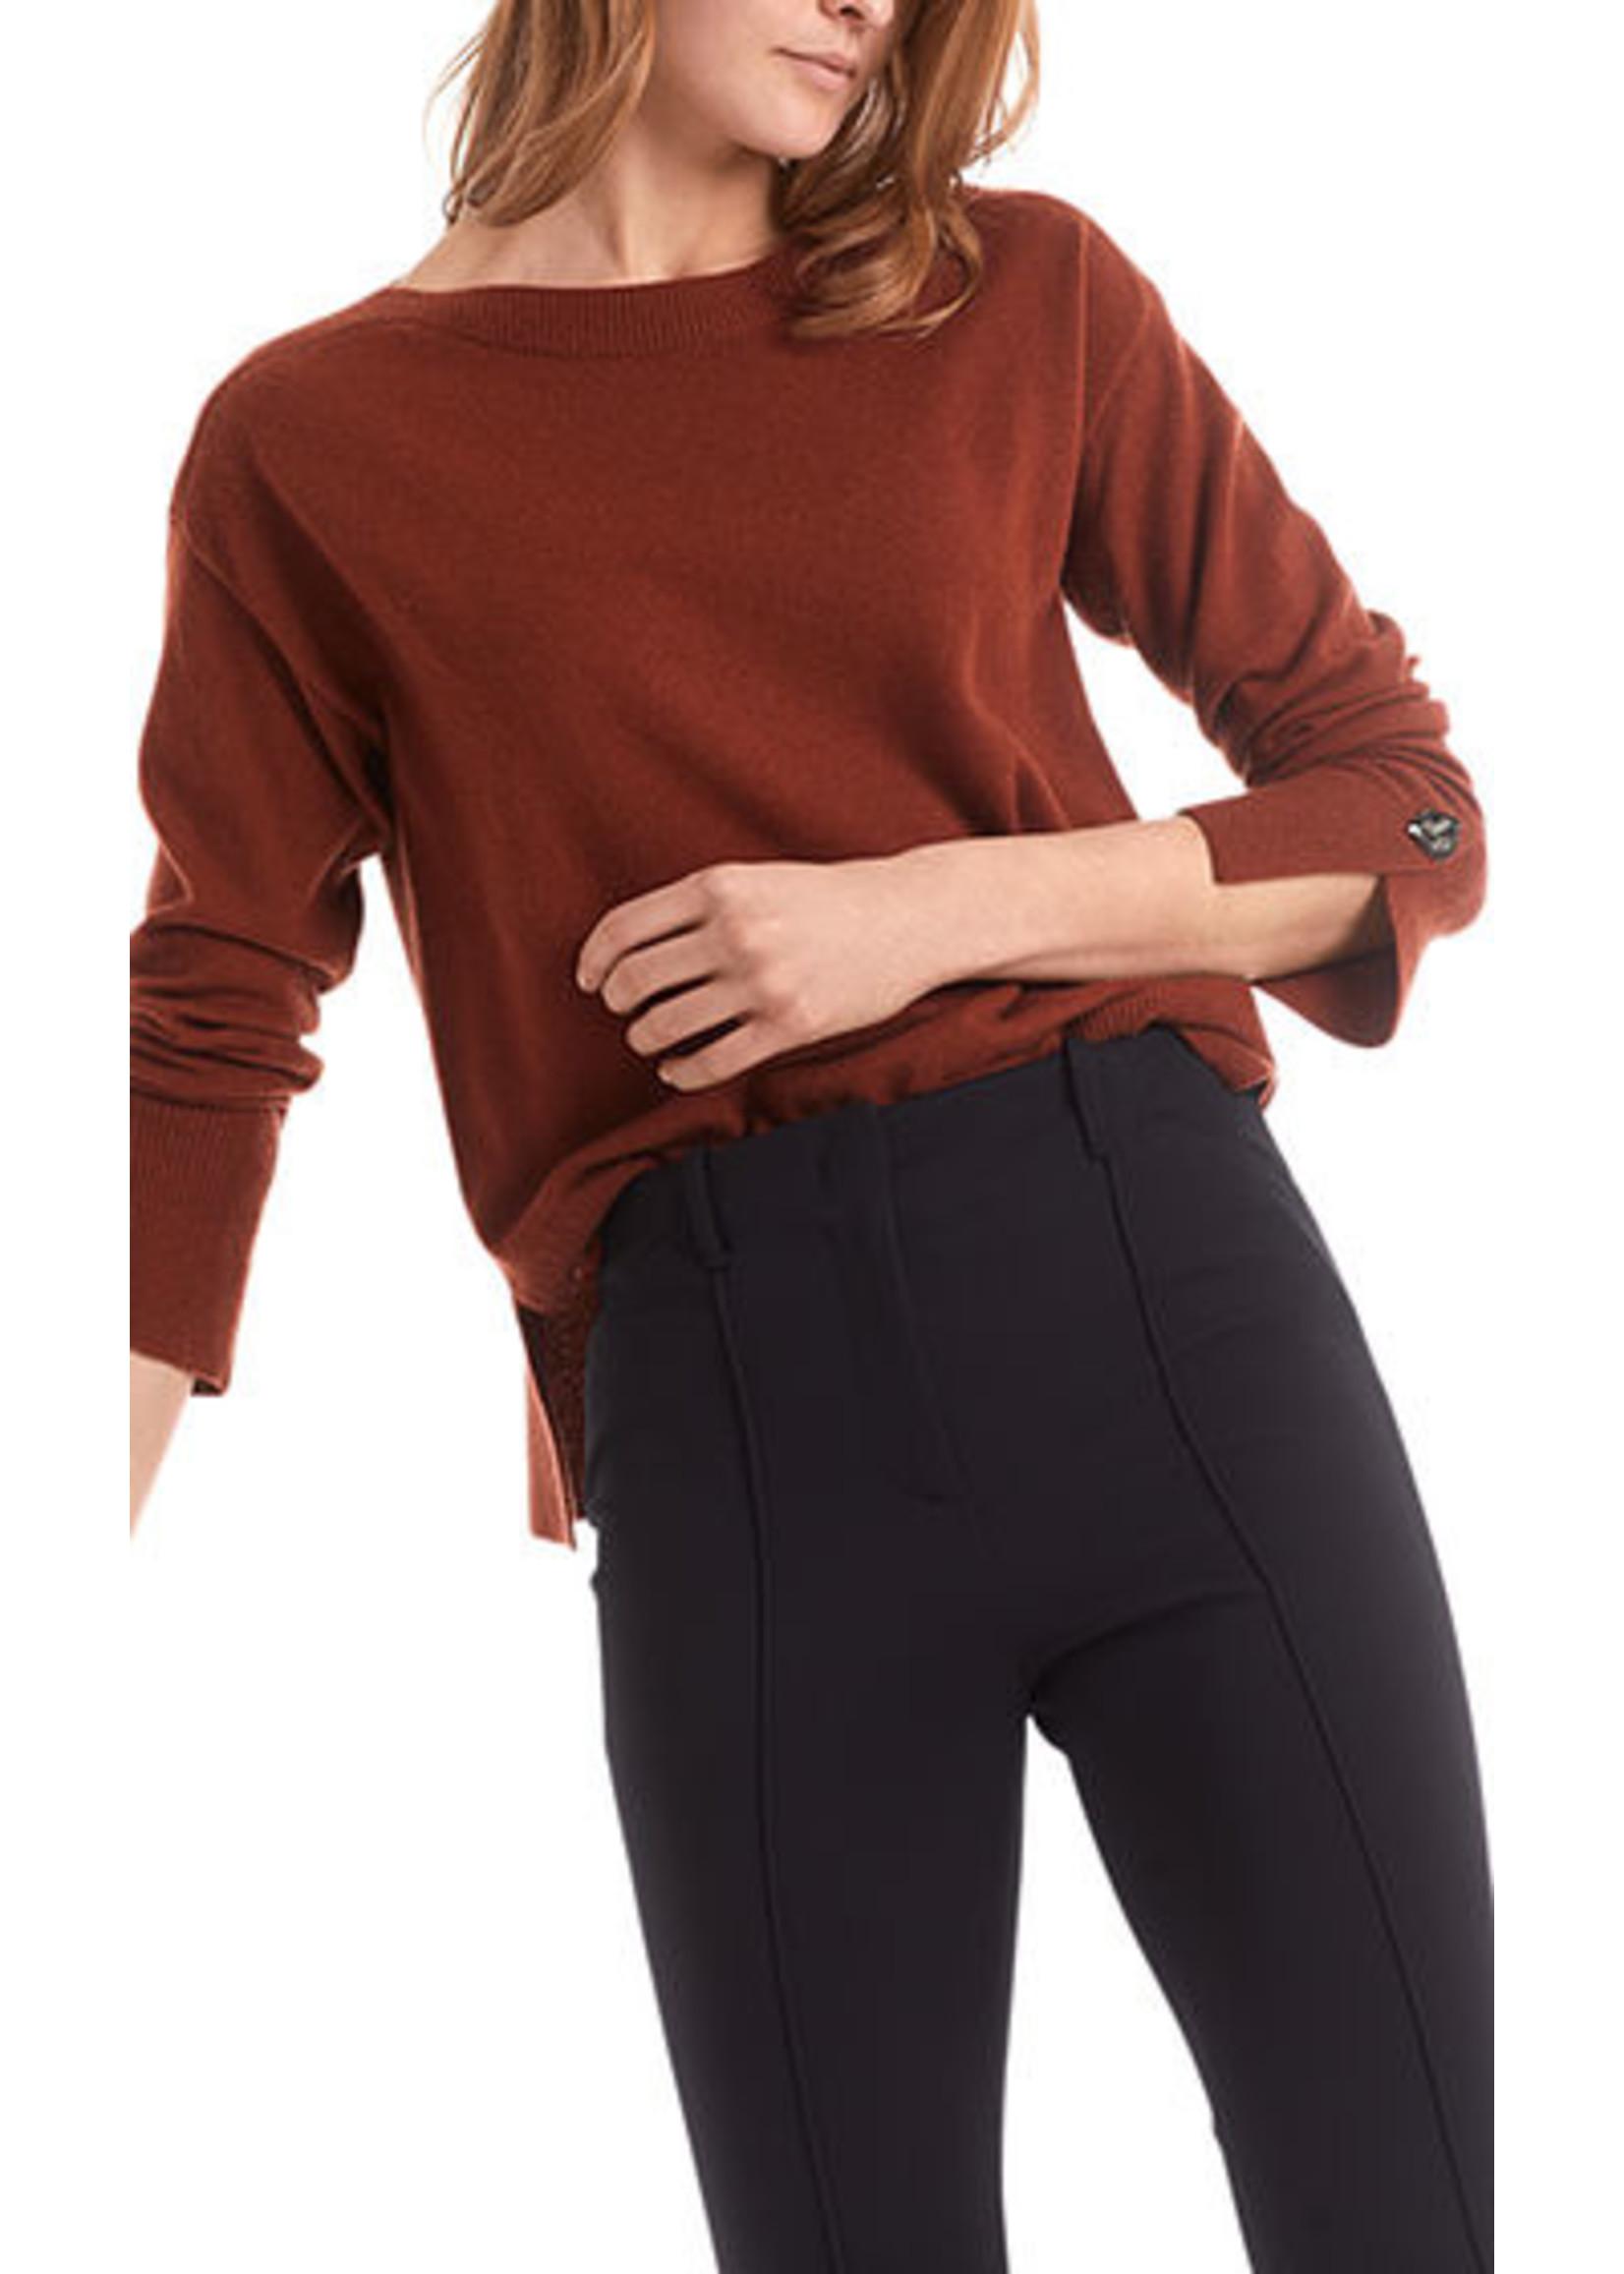 Sweater RC 41.07 M52 mahogany